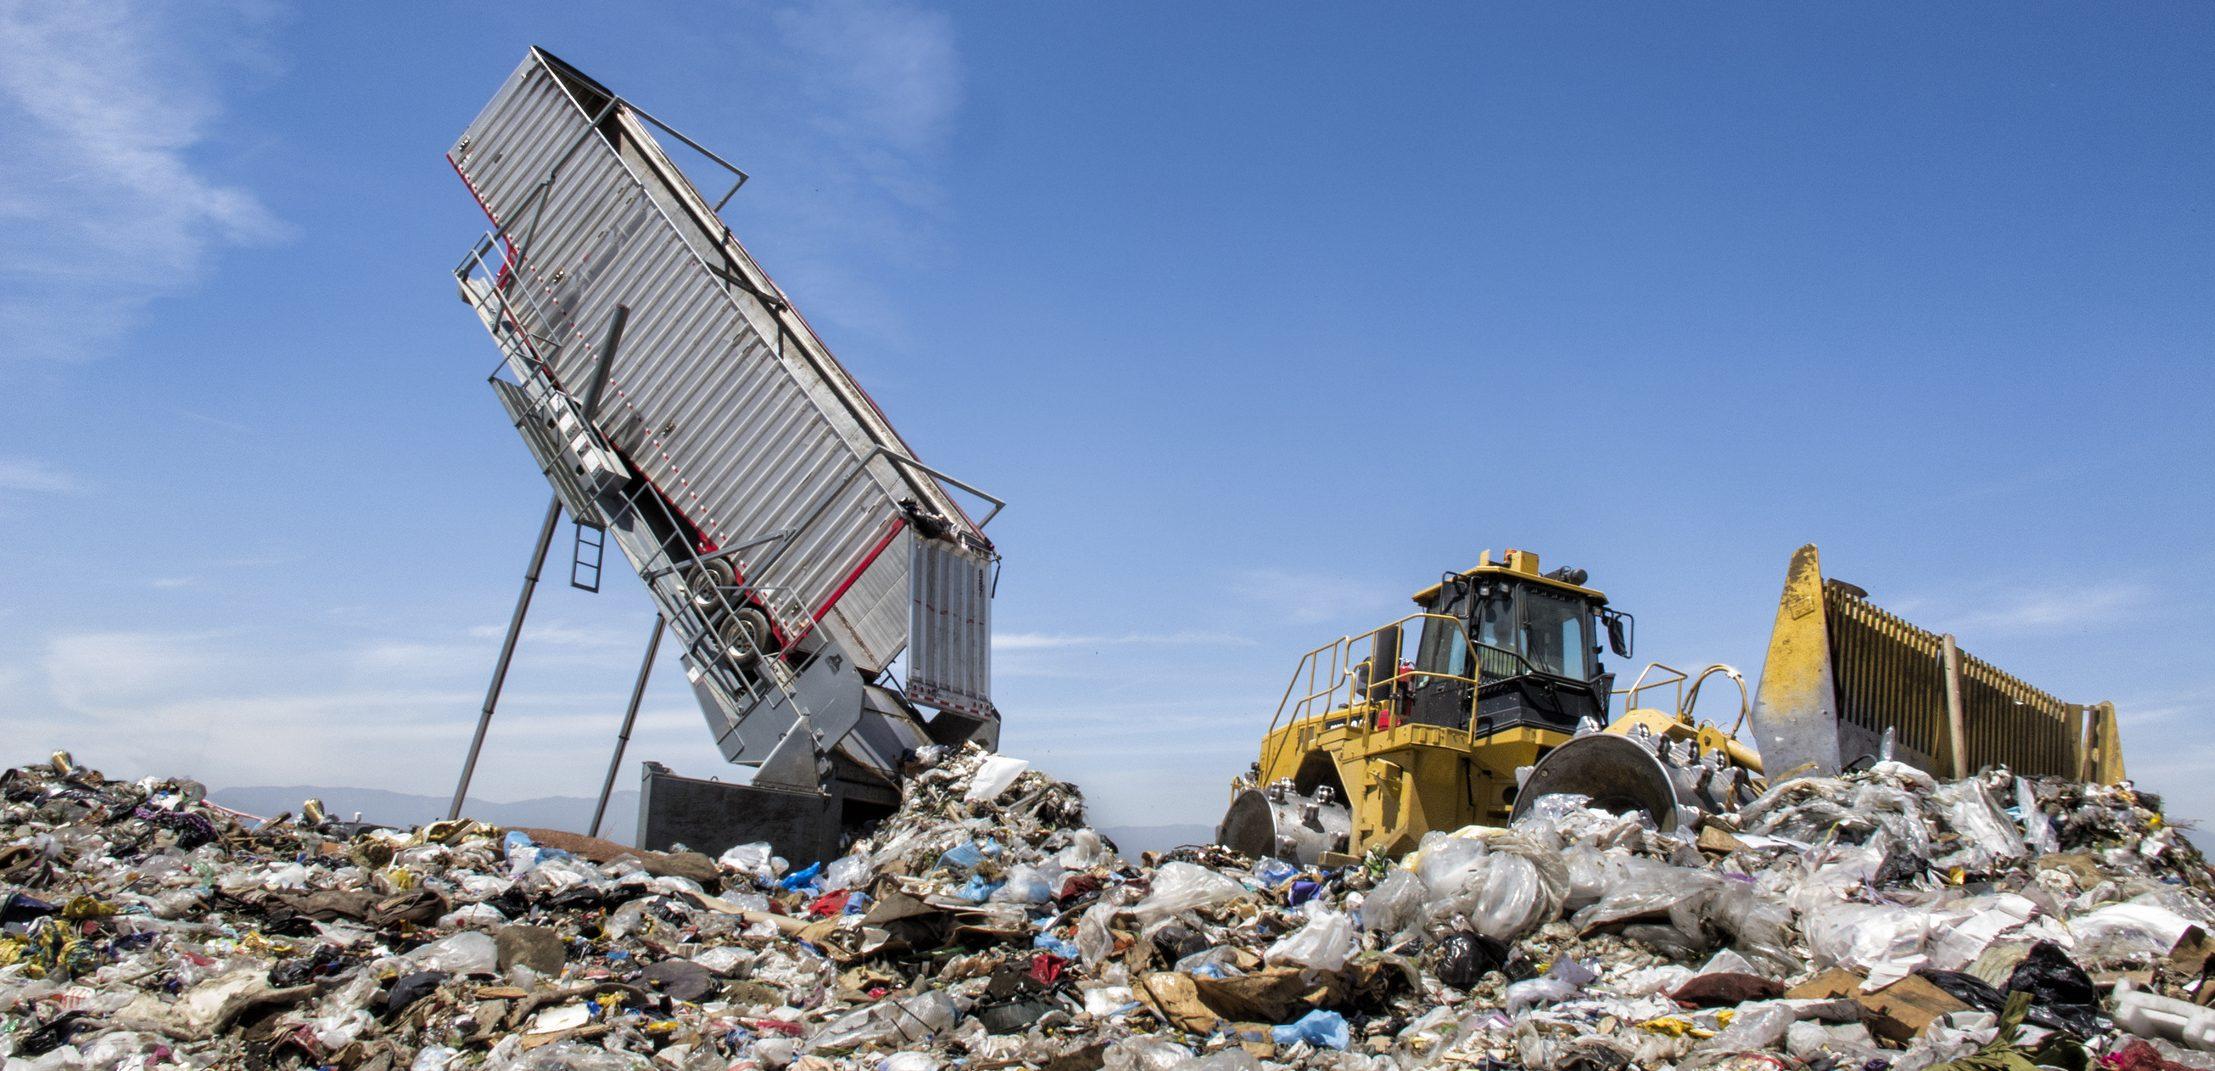 abfallwirtschaft karlsruhe